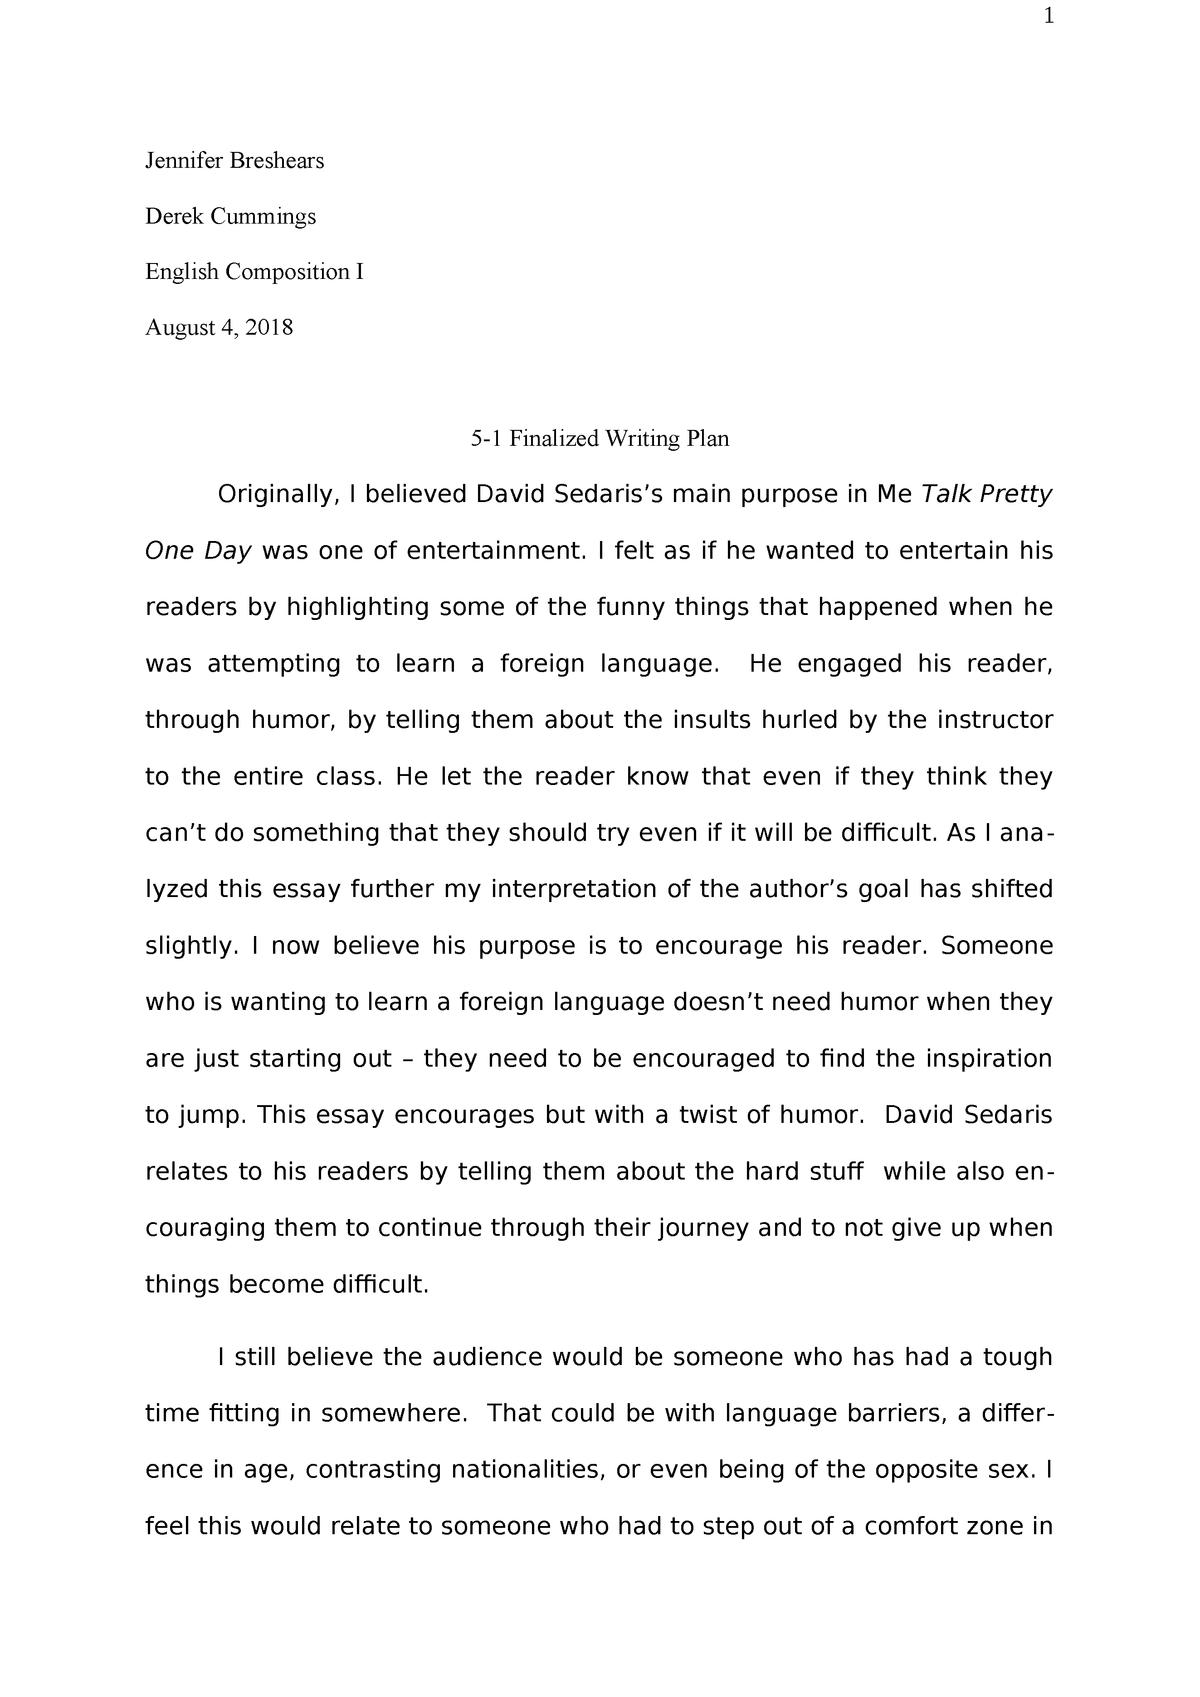 Easy environmental science essay topics